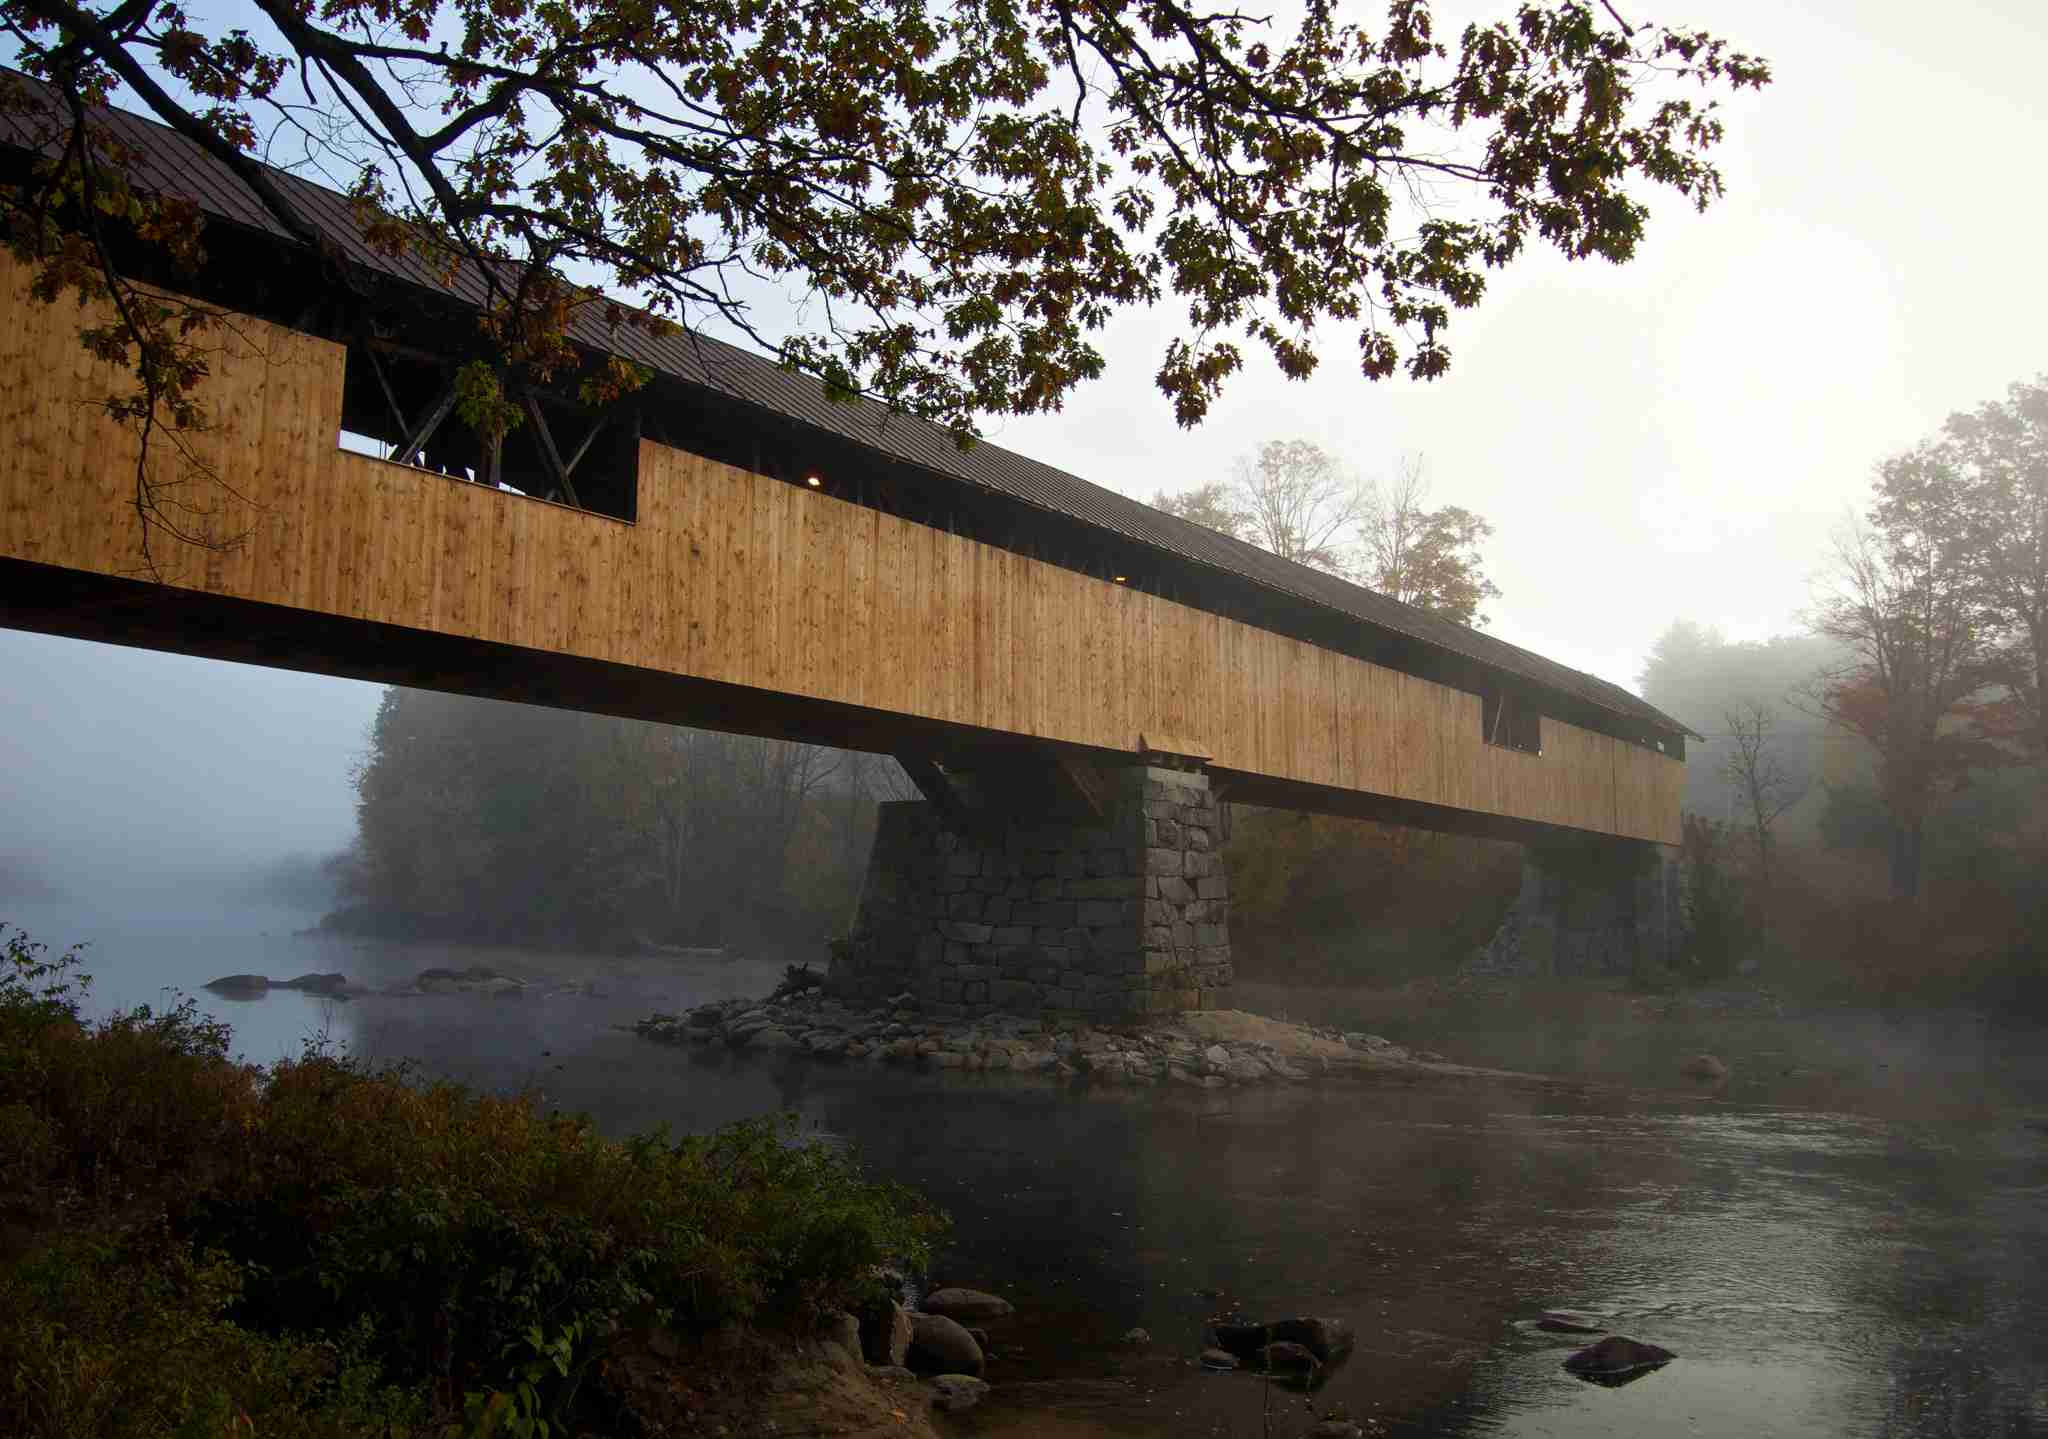 Blair Covered Bridge in New Hampshire